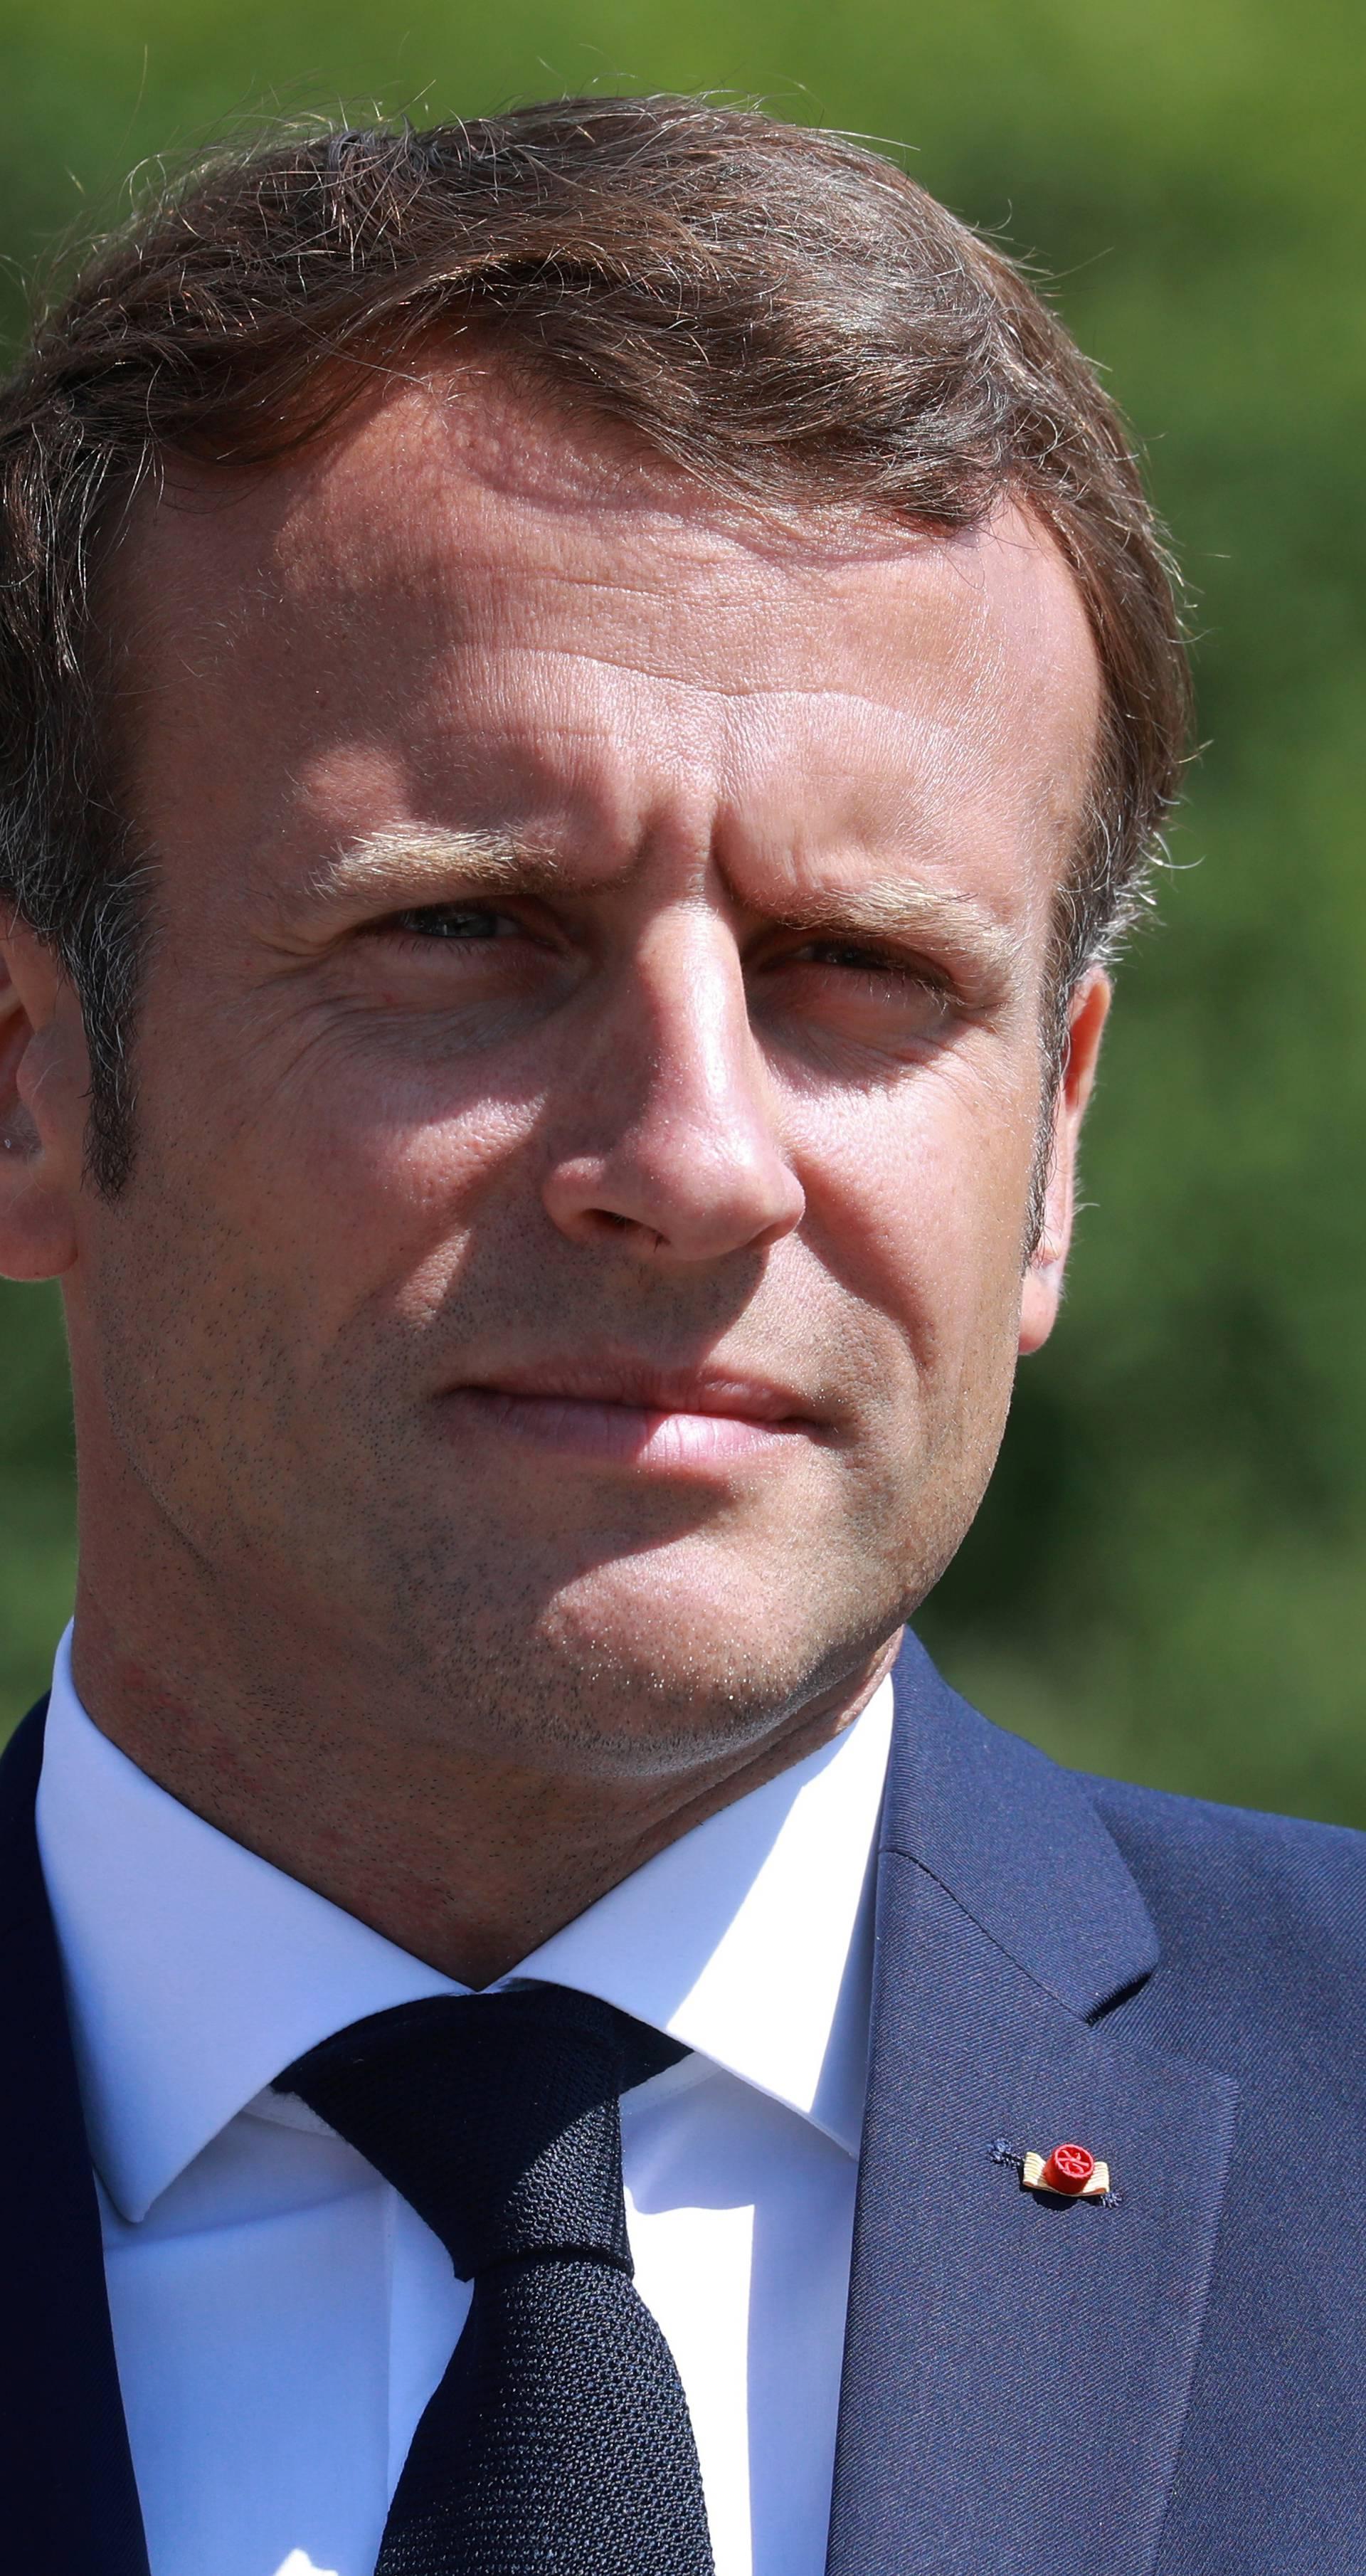 French President Emmanuel Macron visits a factory of manufacturer Valeo, in Etaples